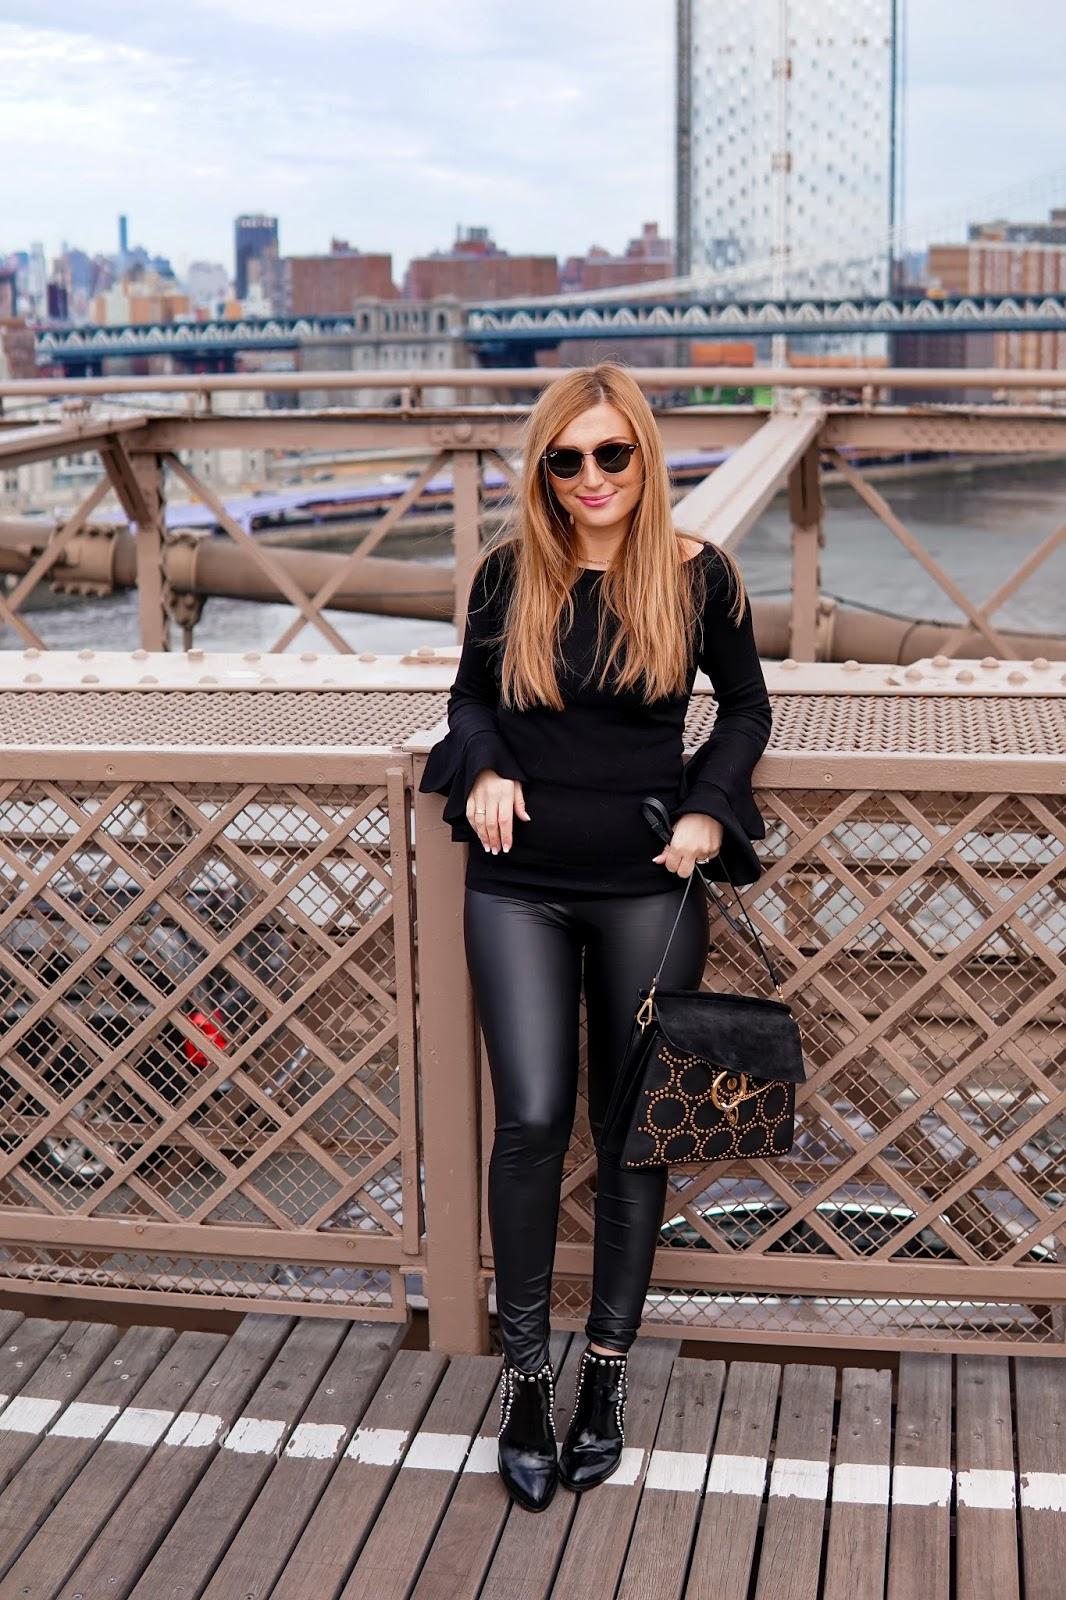 new-york-hotspots-Just-black-lederleggings-schwarze-leggings-bloggertstyle-fashionblogger-outfitinspiration-brooklynbridge-olivia-palermo-style-fashionstylebyjohanna